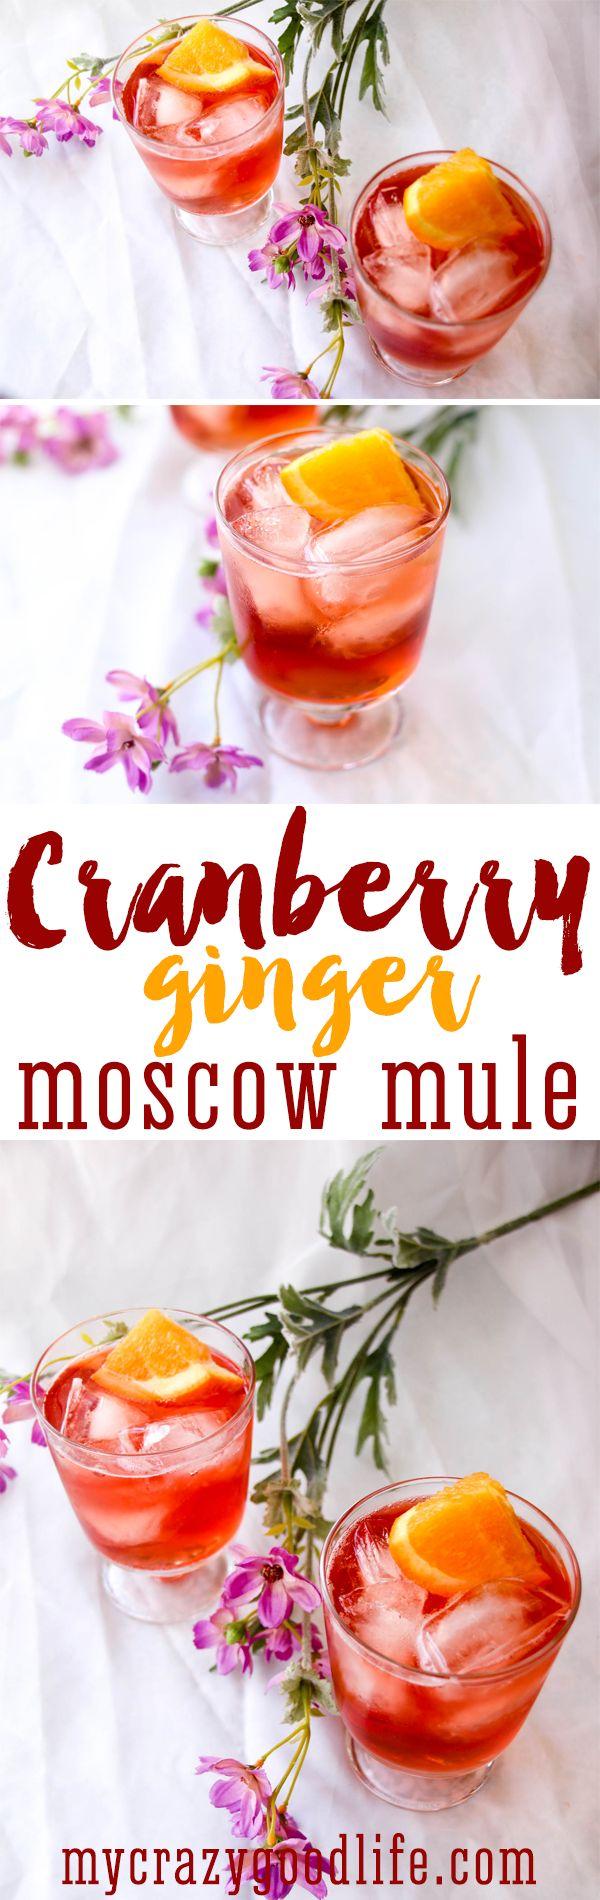 Best 25 cranberry vodka ideas on pinterest cranberry for Cranberry bitters cocktail recipe